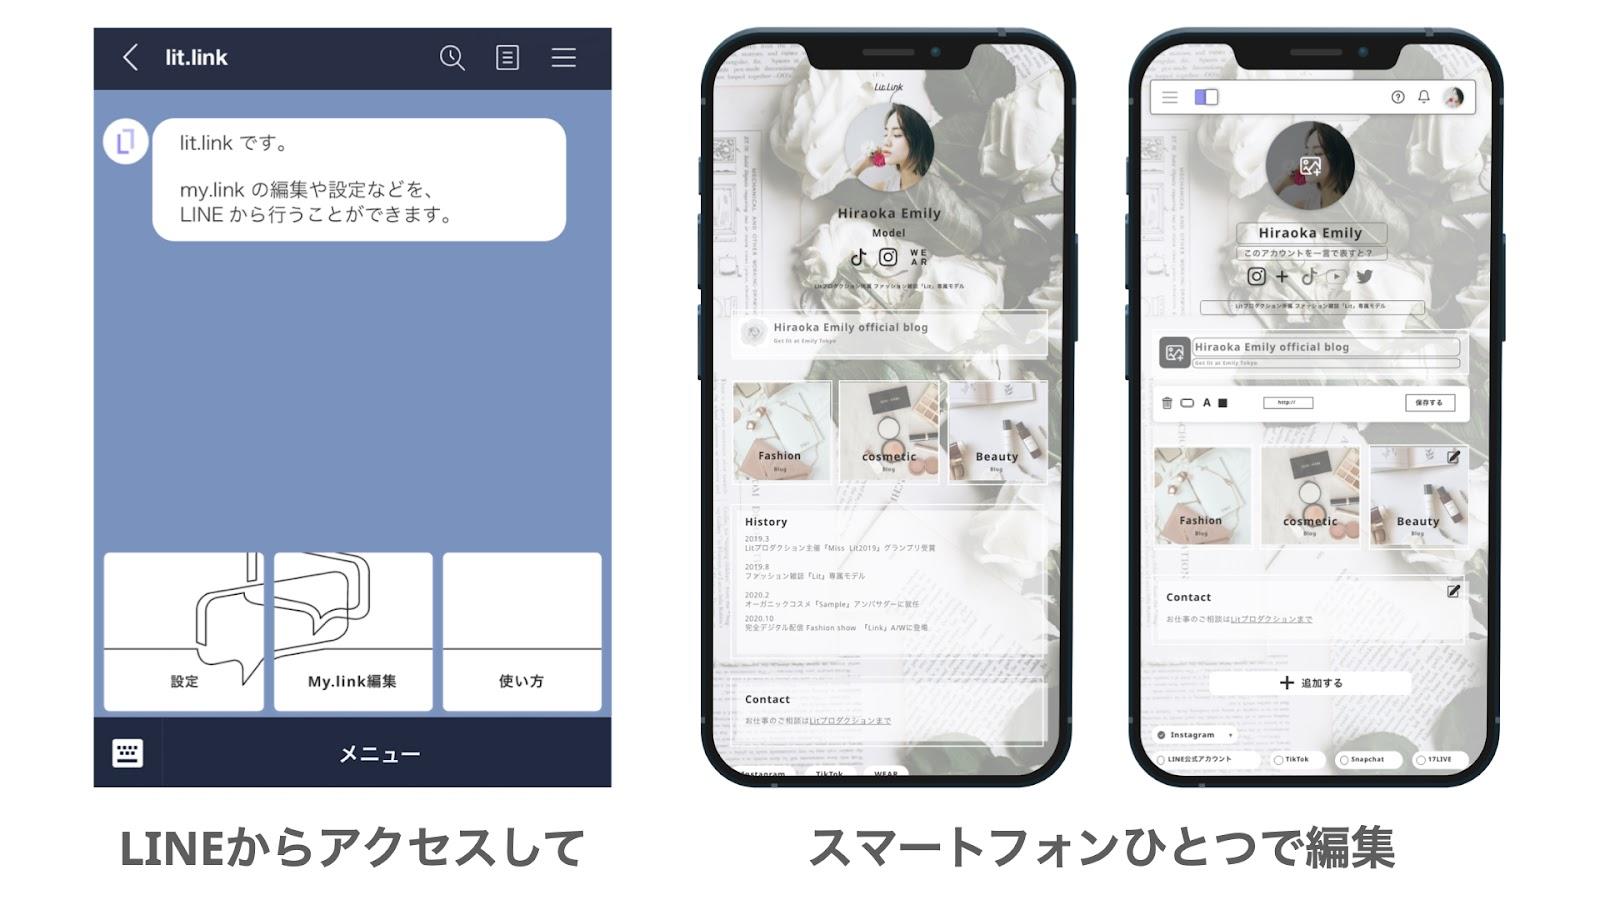 lit.link_操作画面